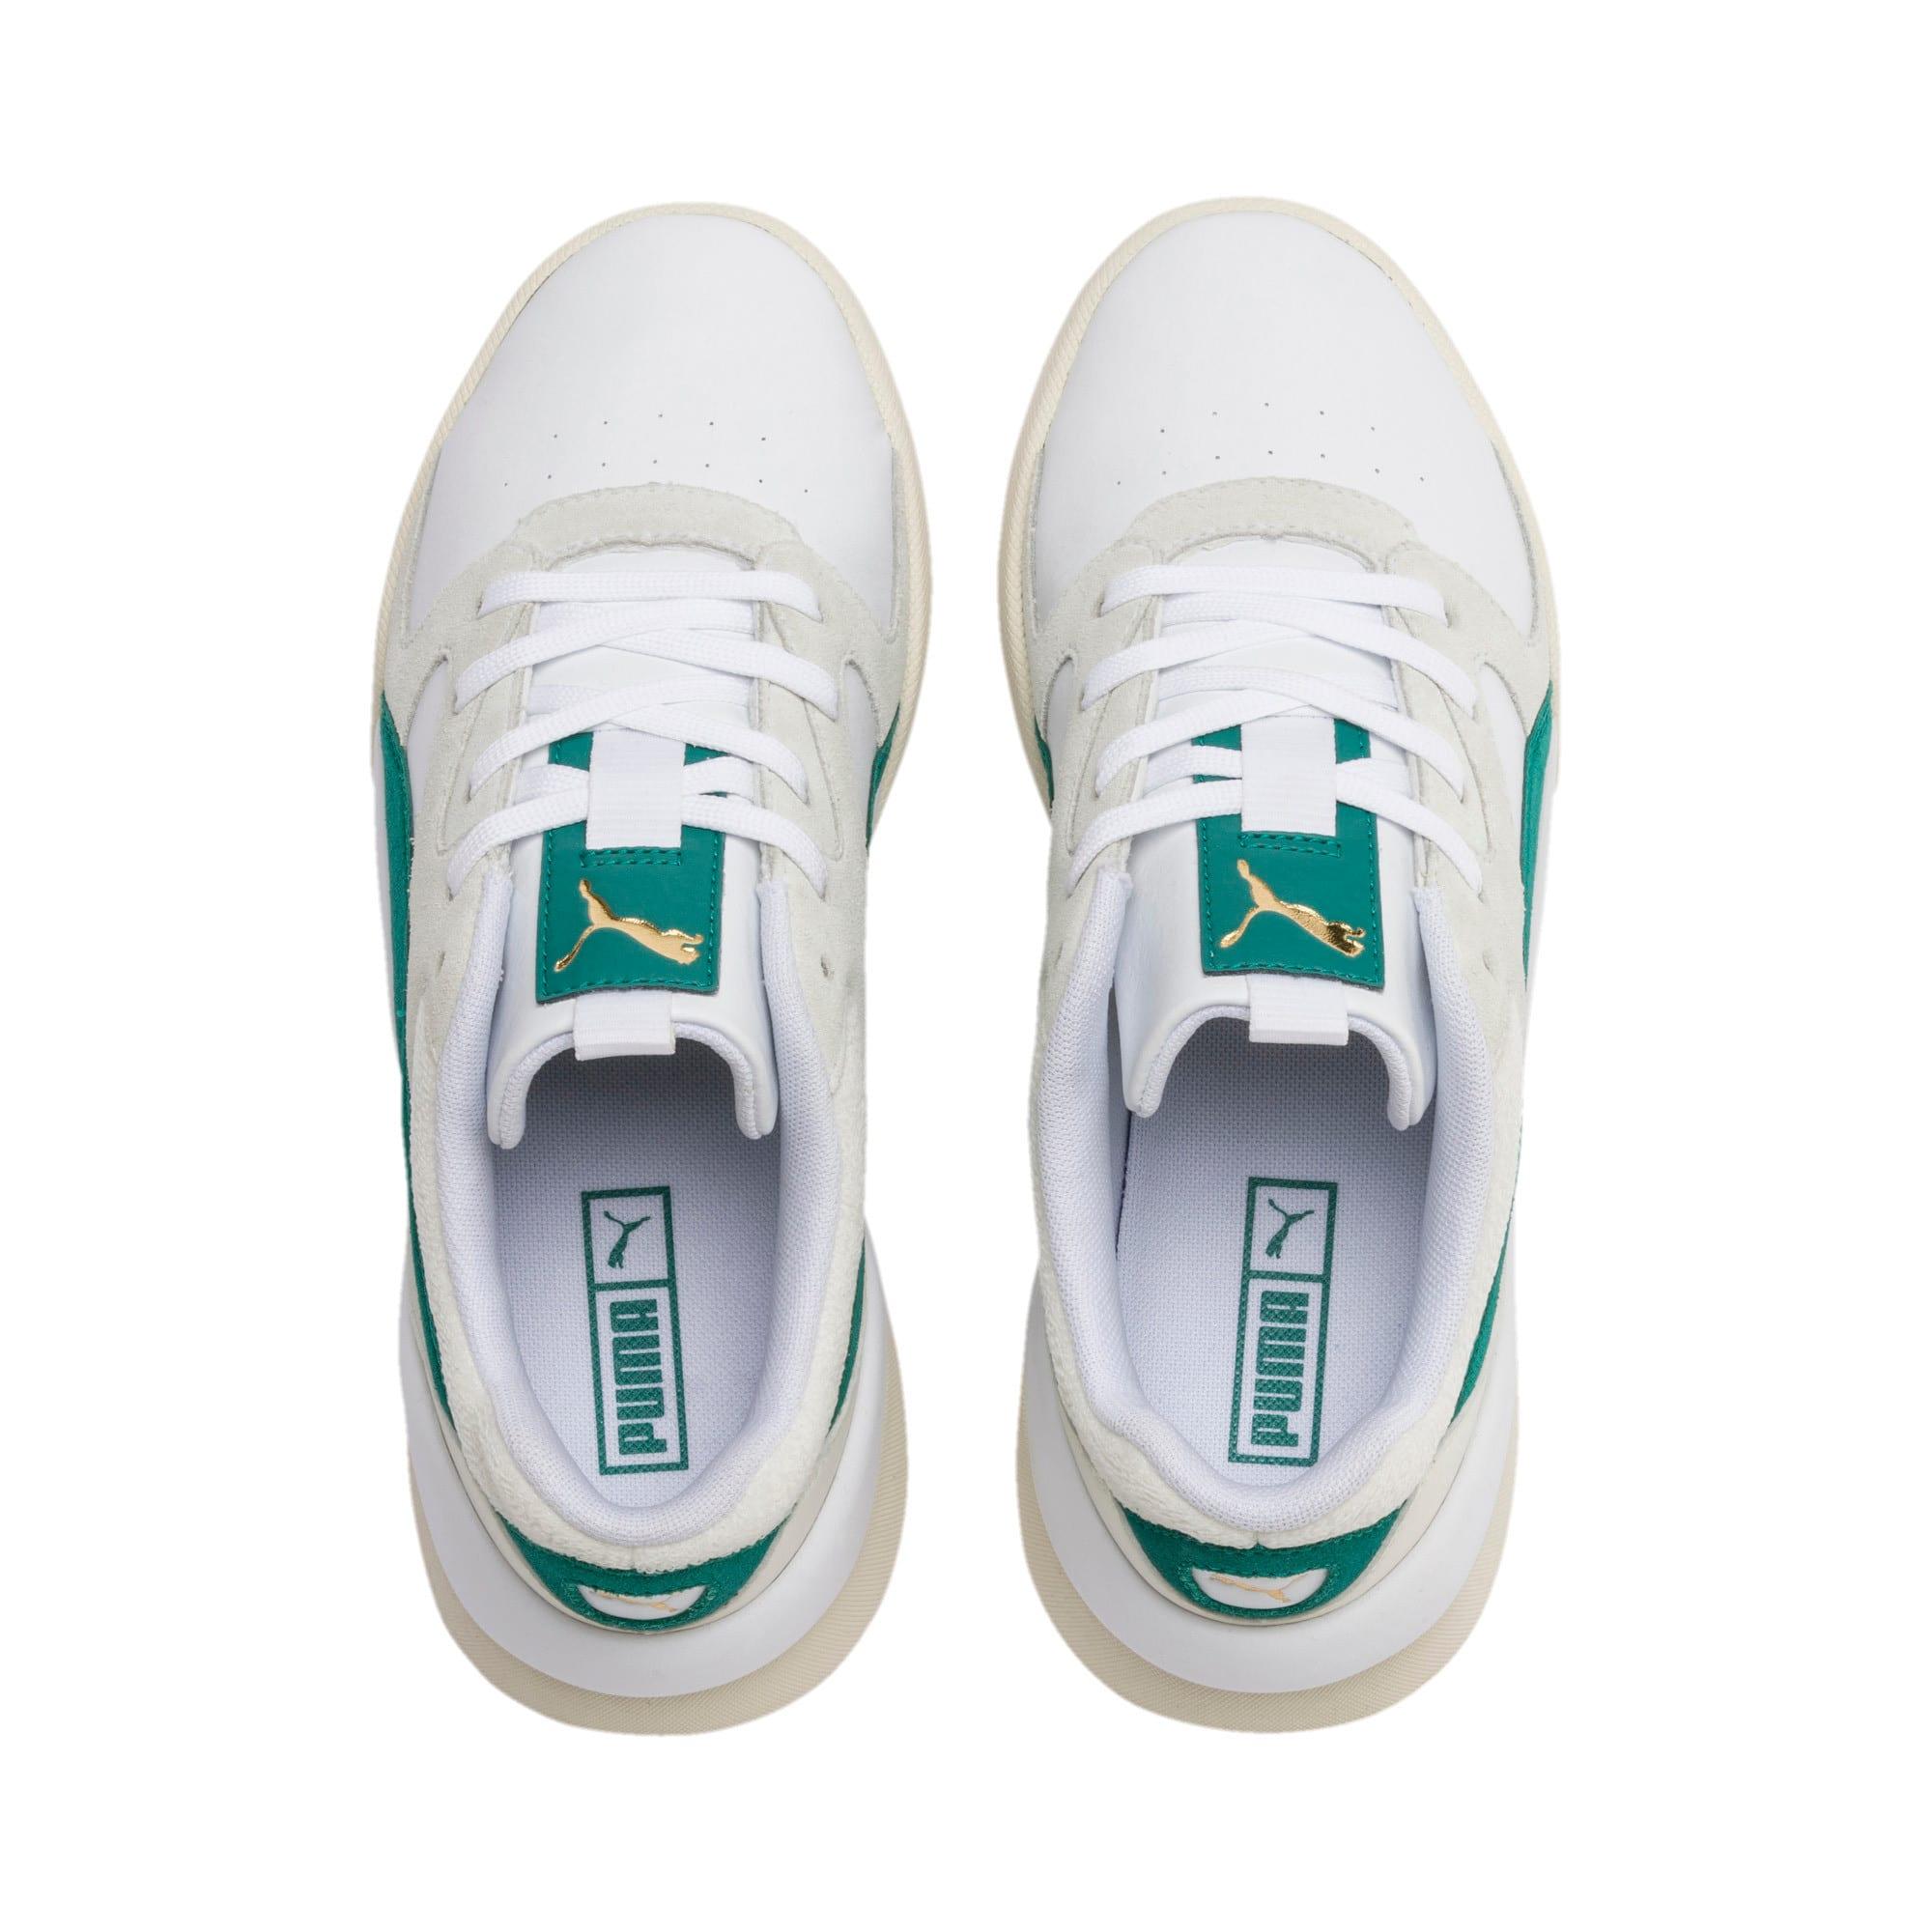 Thumbnail 7 of Aeon Heritage Women's Sneakers, Puma White-Teal Green, medium